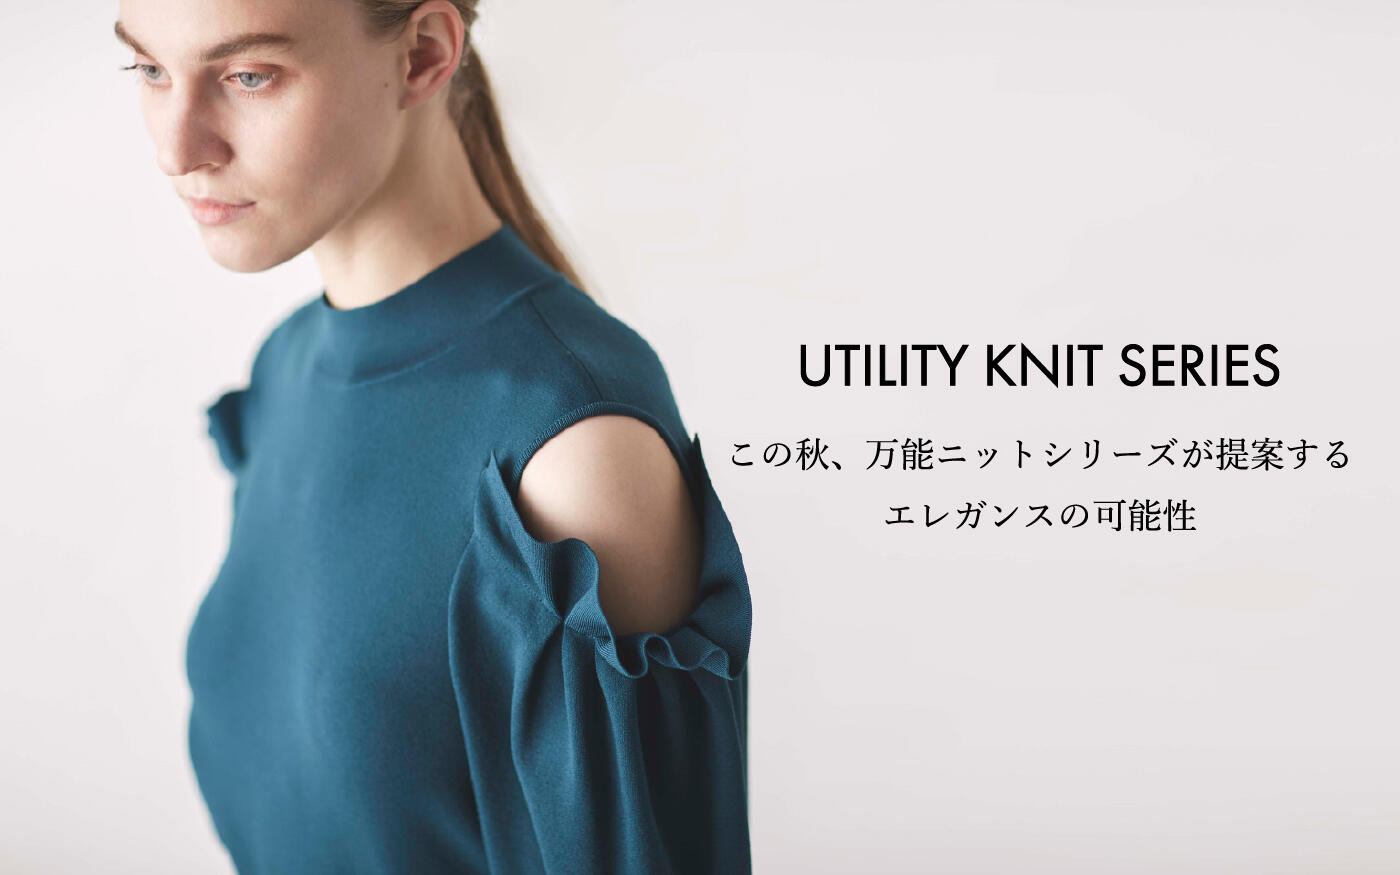 UTILITY KNIT SERIES | この秋、万能ニットシリーズが提案するエレガンスの可能性